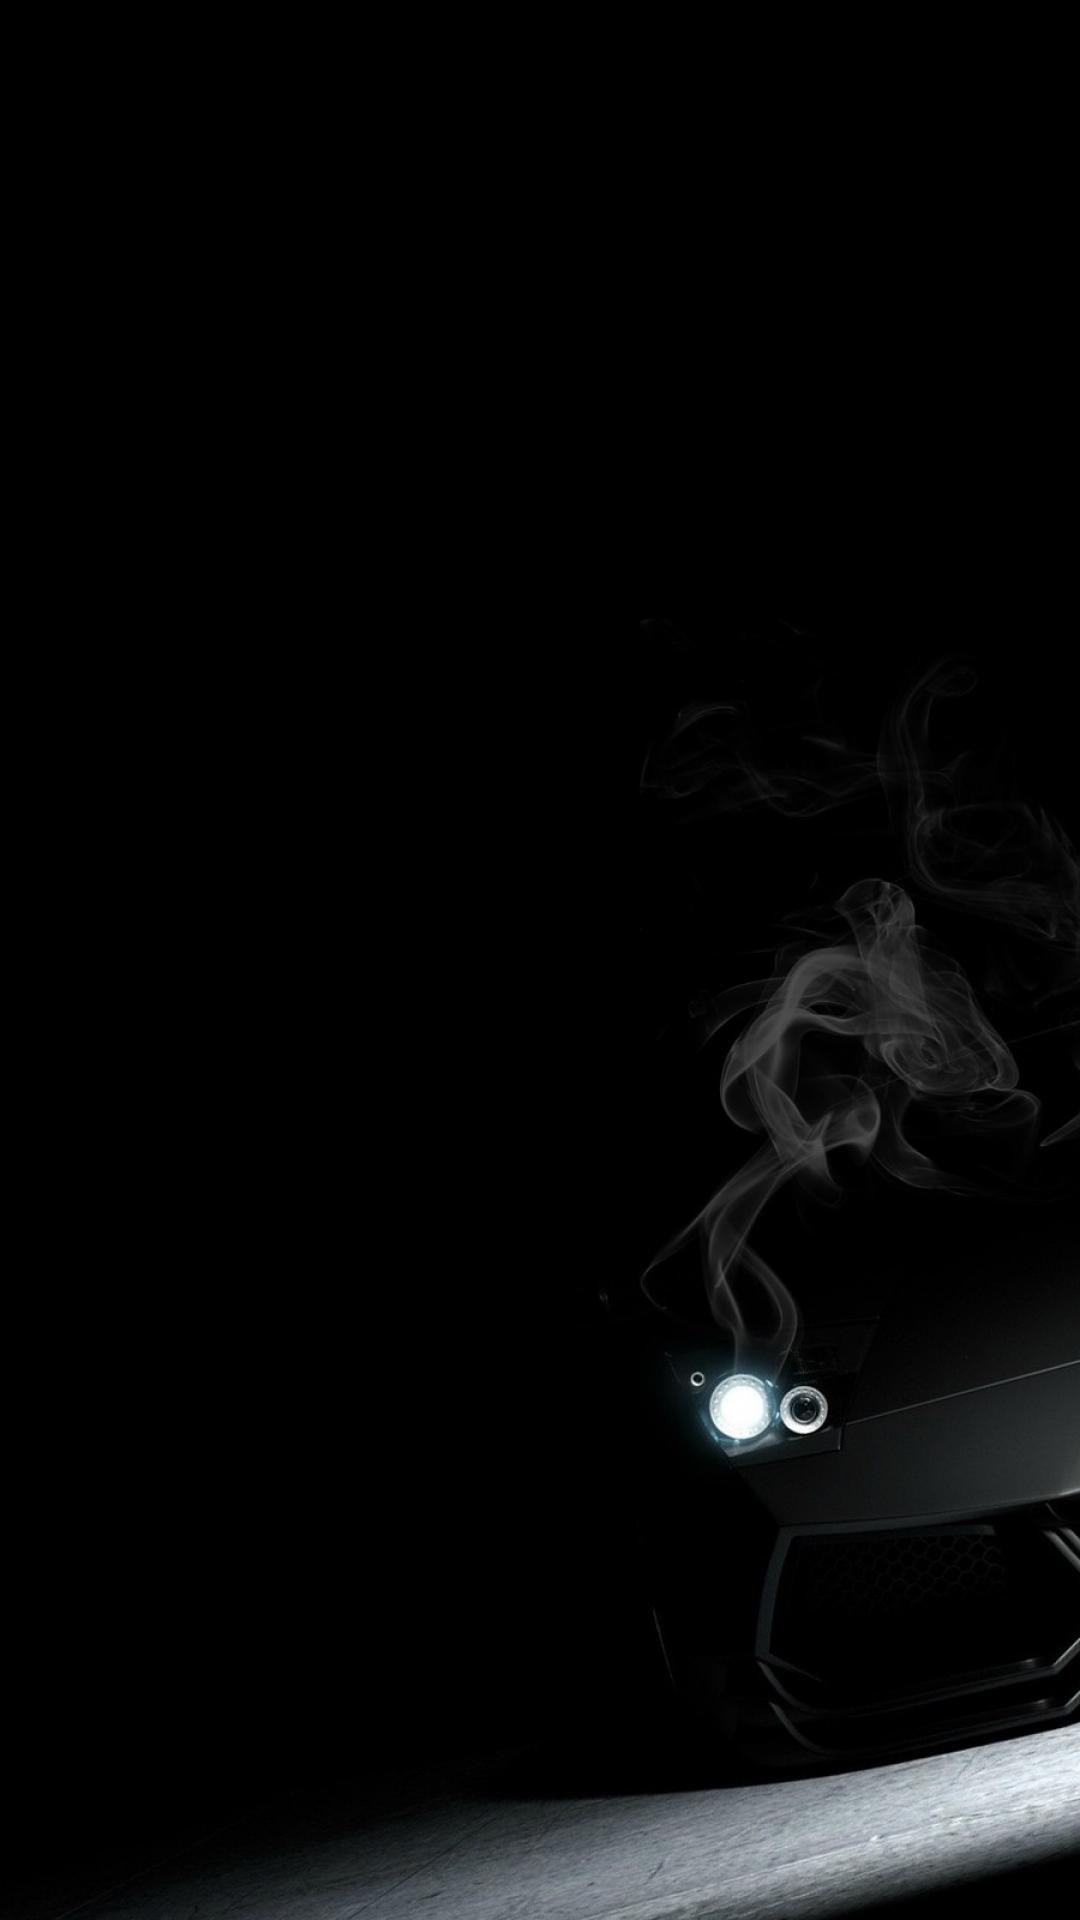 Mercedes amg gt, ford mustang and miami graffiti, audi a8, gran turismo sport mclaren, range rover, porsche 911 gt3 rs, chevrolet camaro, bmw 745, bmw 4 series white, urus lamborghini, chevrolet camaro ss, acura nsx in garage, yellow lamborghini urus super suv, ford mustang coupe, 2020 ford explorer, bmw alpina xd4, peugeot quartz concept cars. Black Hd Car Wallpapers For Mobile The Best 4k Hd Car Wallpapers Of Supercars Hyper Cars Muscle Cars Sports Cars Concepts Exotics For Your Desktop Phone Or Tablet Magiadeverao